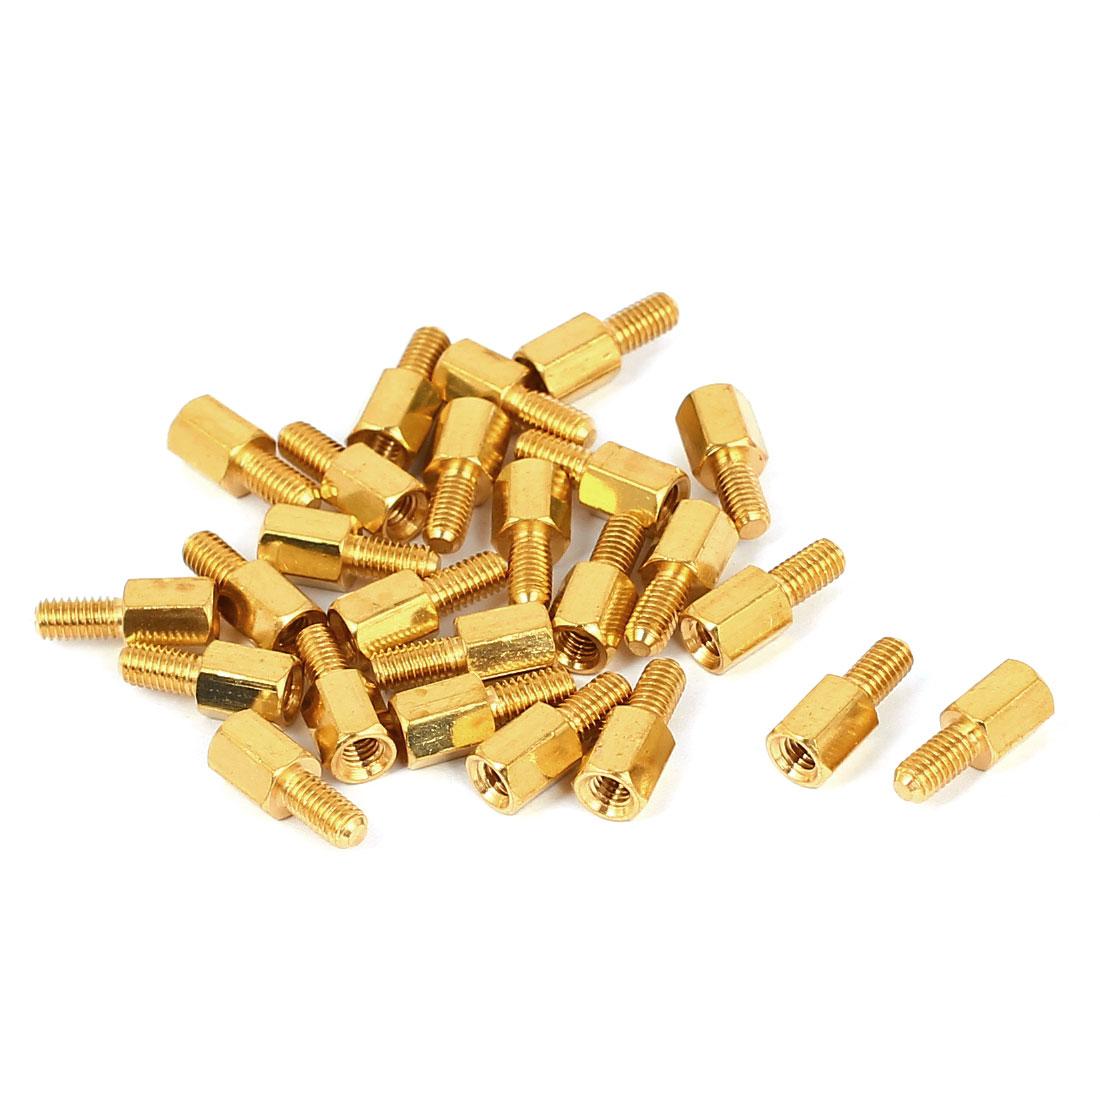 M3x6+6mm Female/Male Threaded Brass Hex Standoff Pillar Spacer Coupler Nut 25pcs